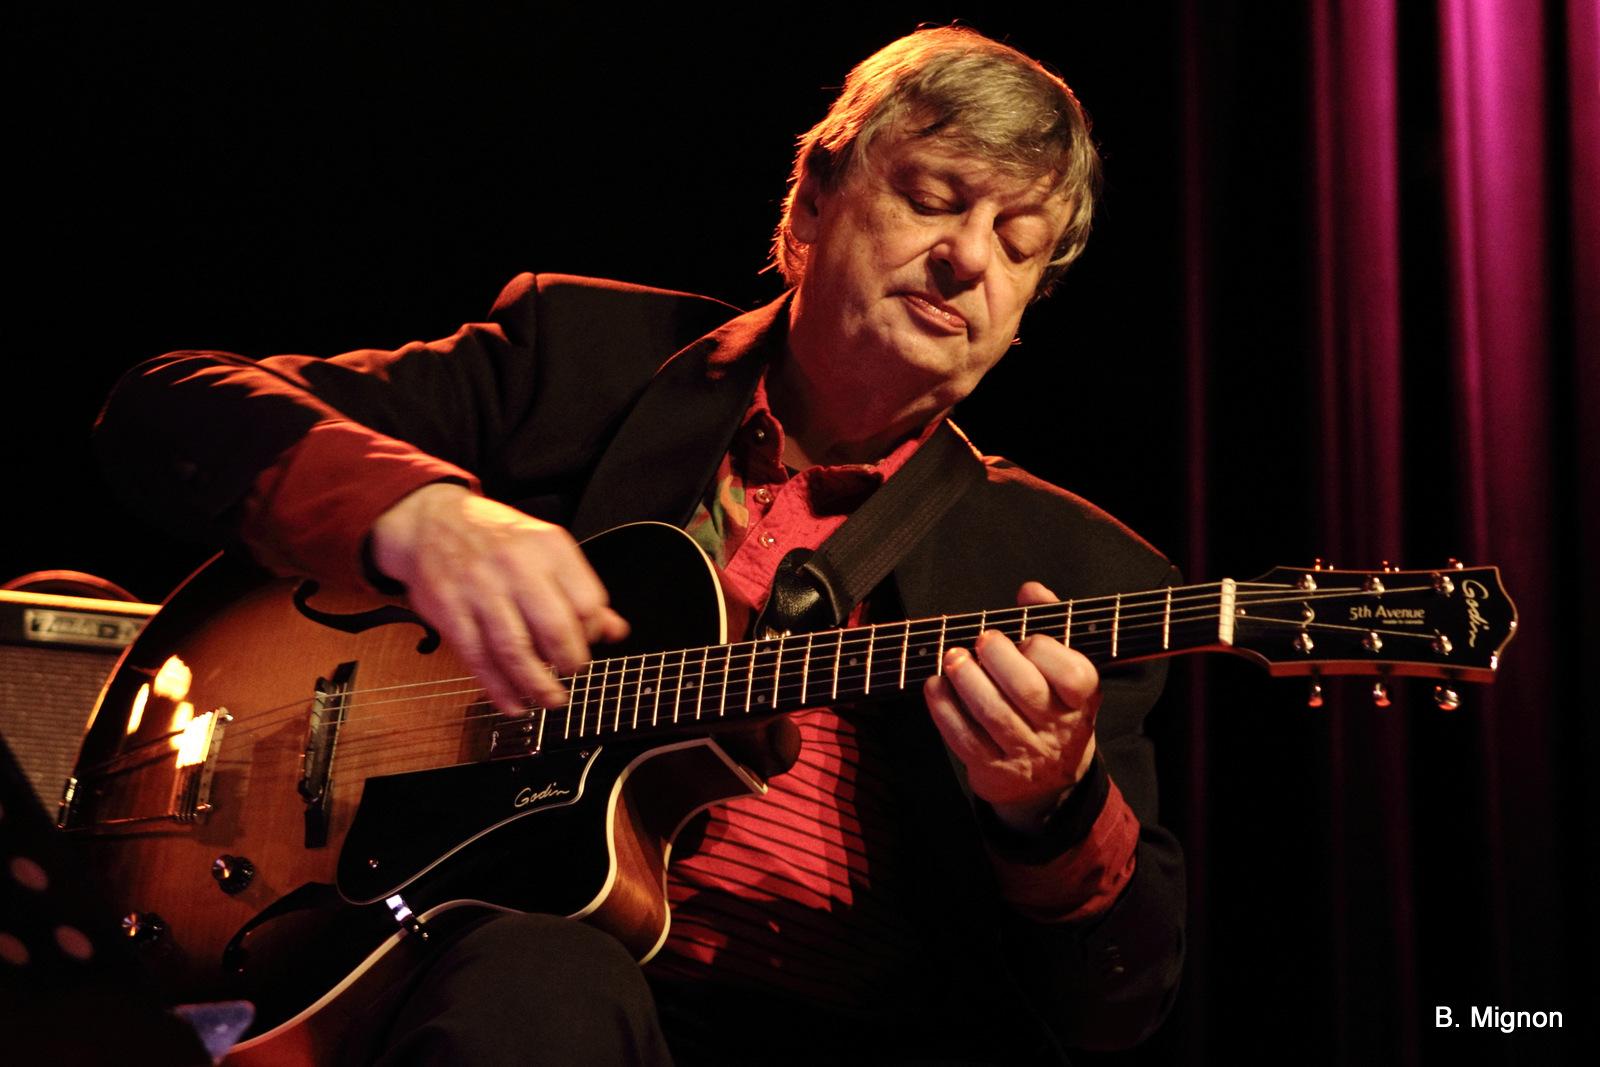 Philip Catherine - L'Autre Rive - Jazz